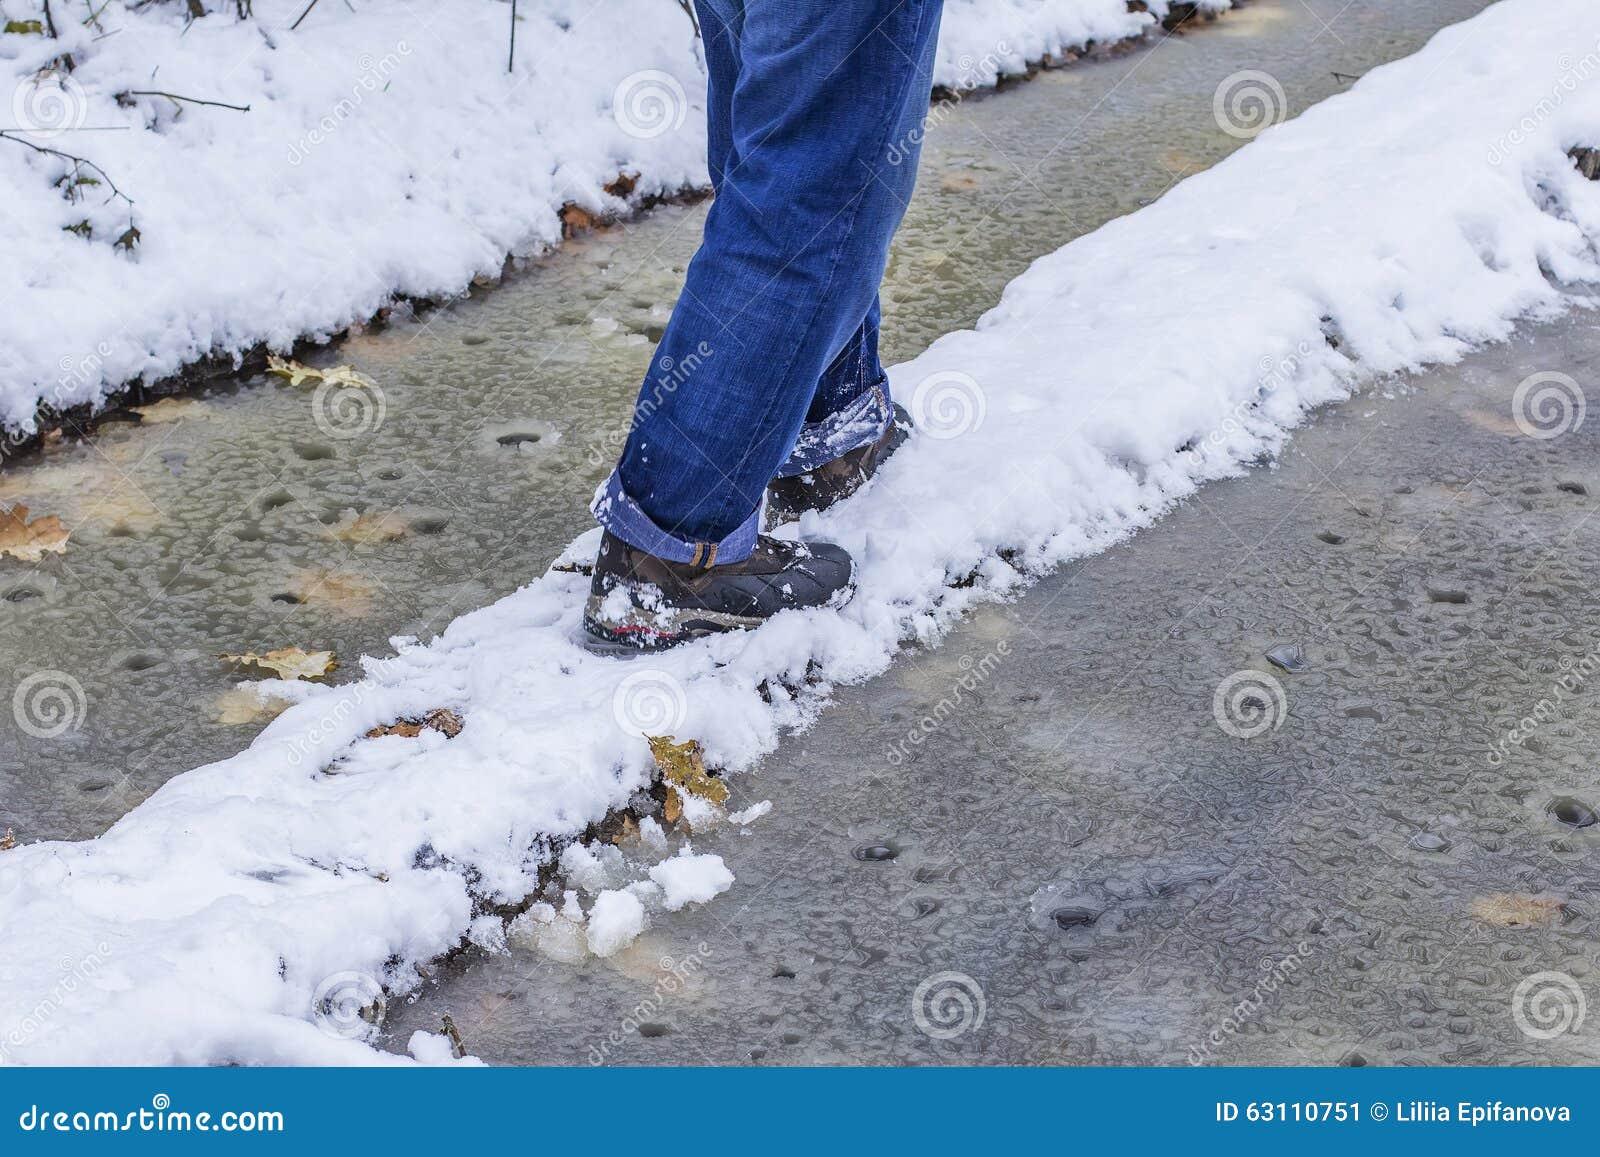 man walking along a narrow path perilous winter at wet weather